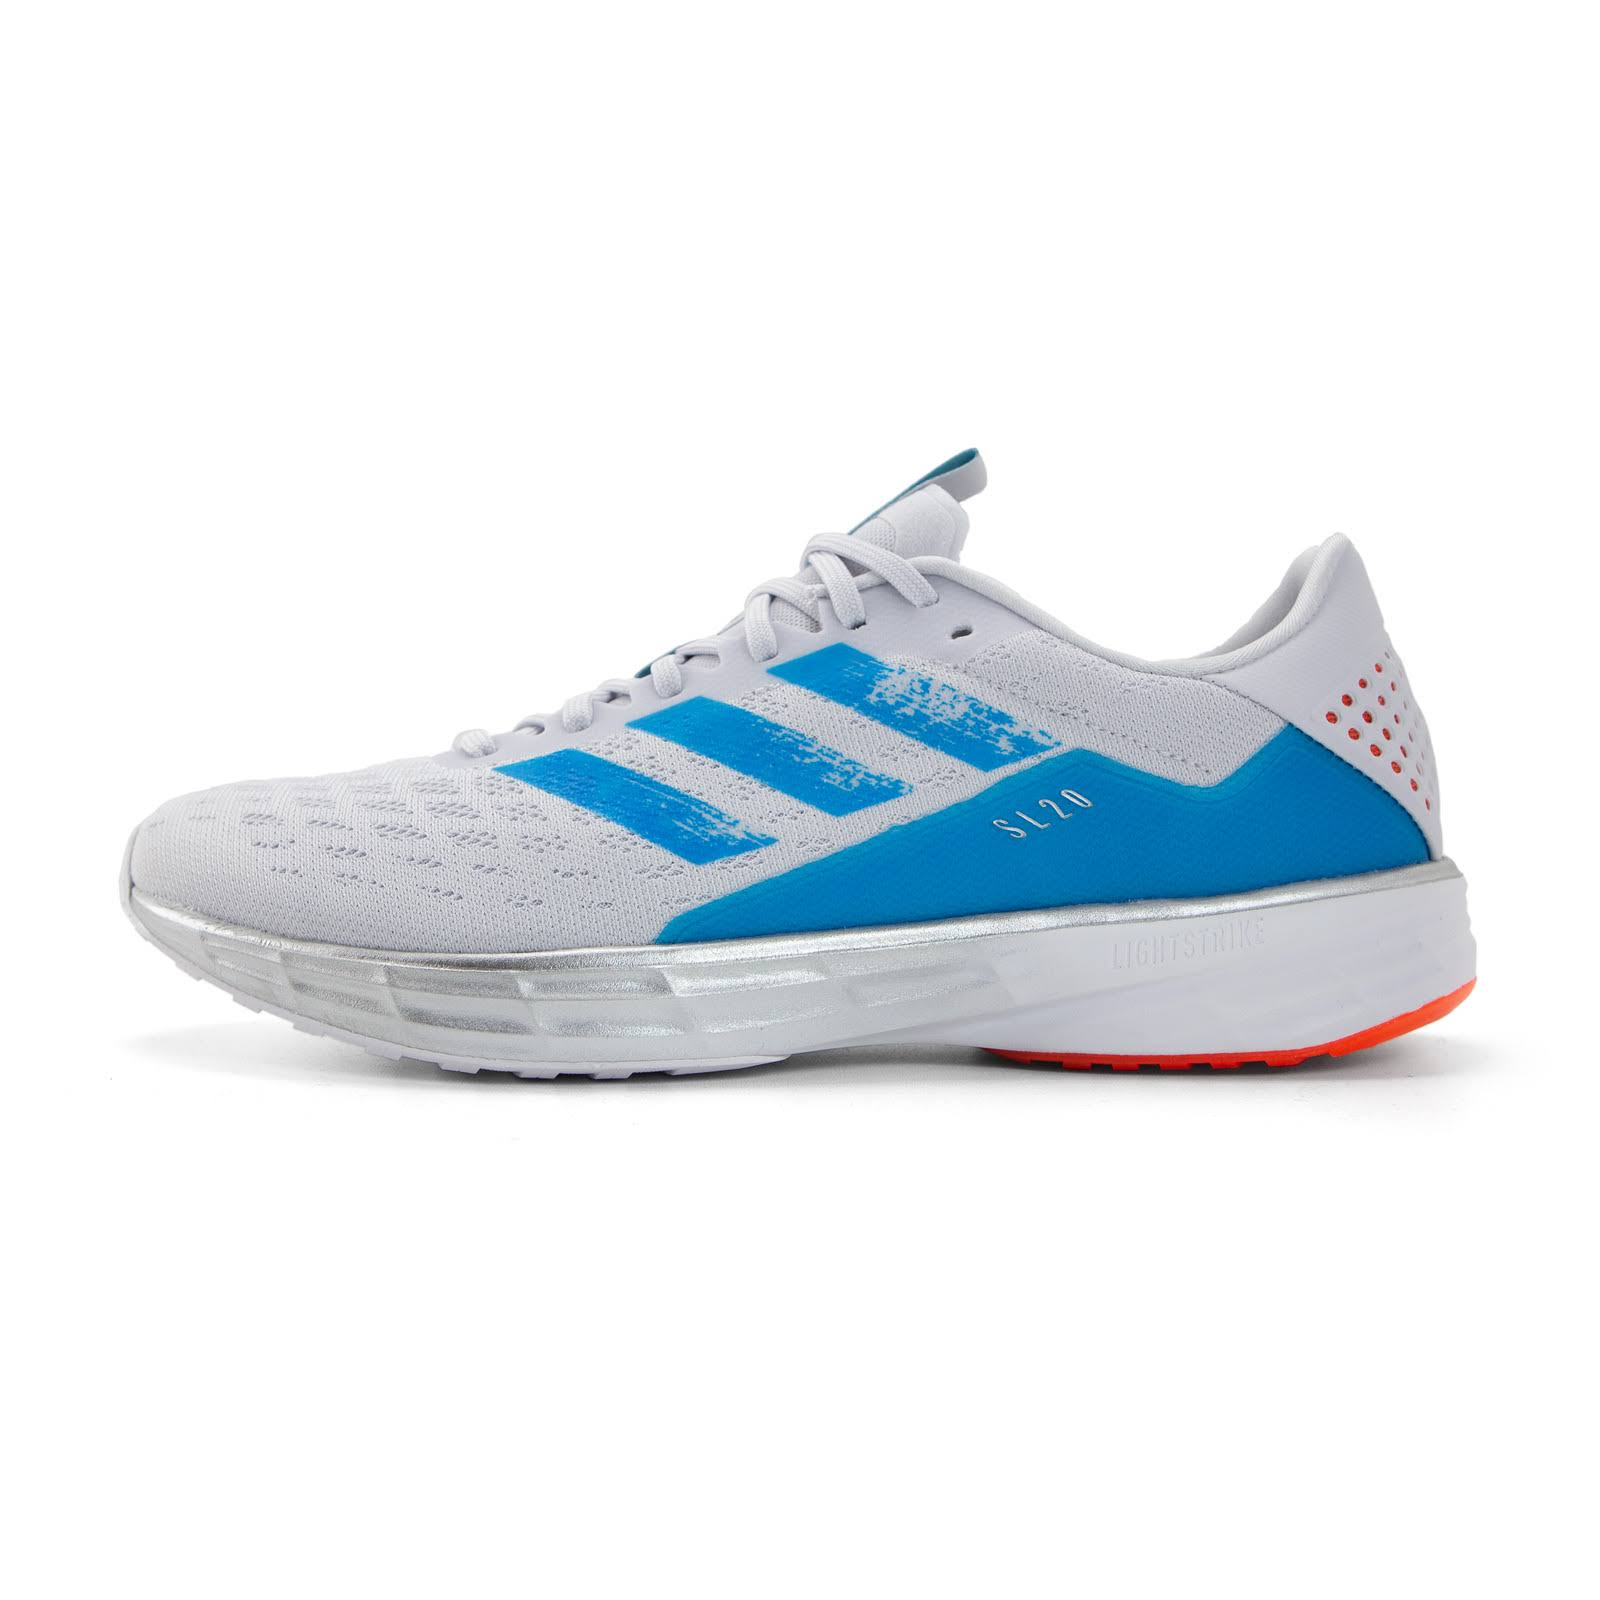 Adidas SL20 Primeblue Dash Grey Sharp Blue True Orange